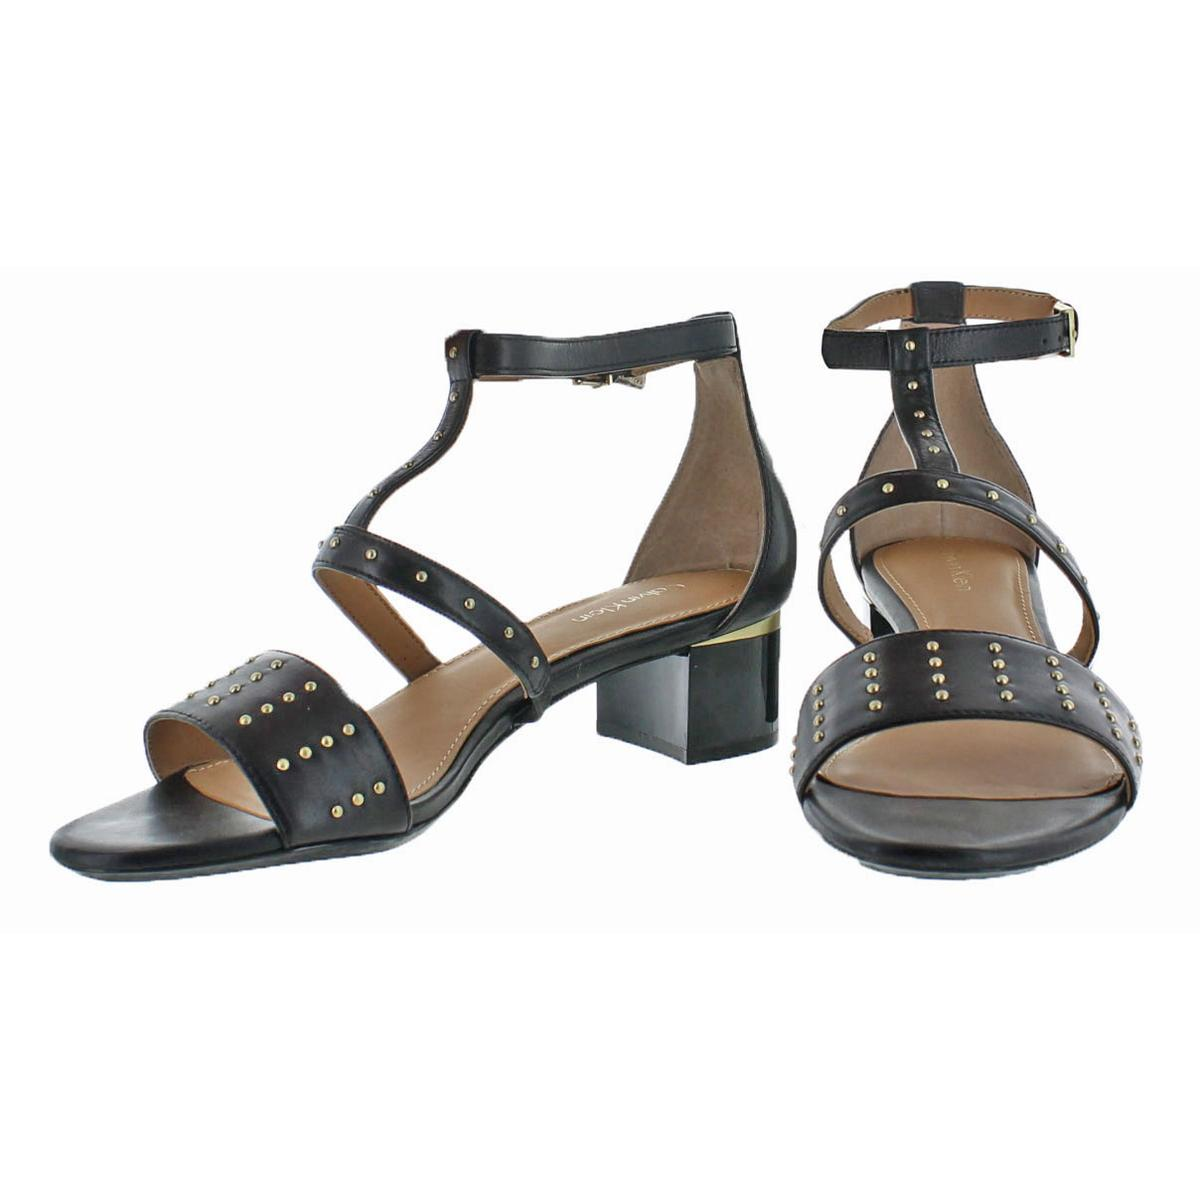 Calvin-Klein-Divina-Women-039-s-Open-Toe-Studded-Block-Heel-Shoes thumbnail 4